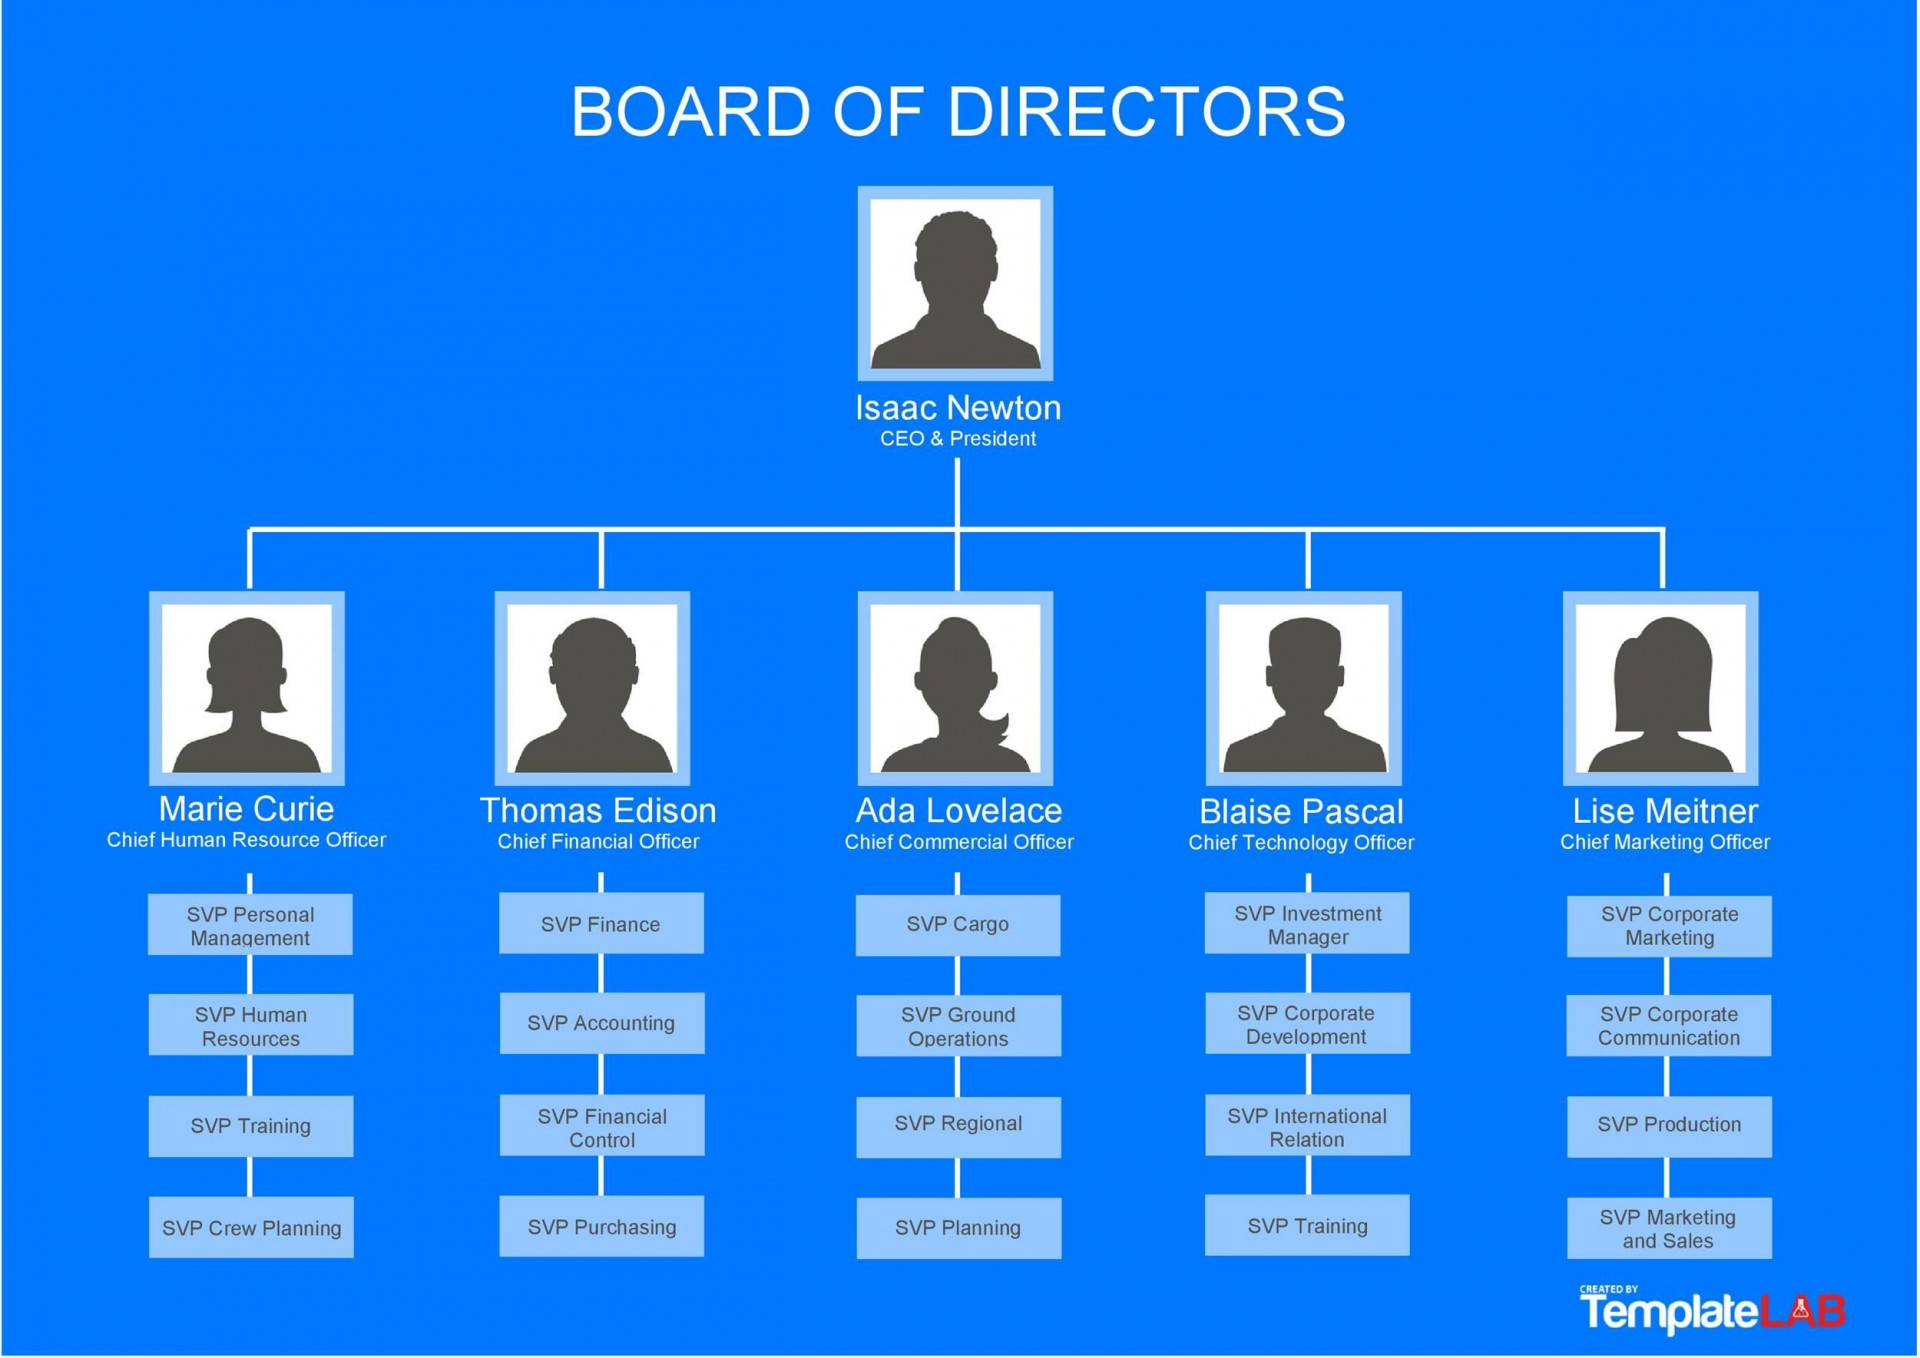 006 Marvelou Organizational Chart In Microsoft Powerpoint 2010 Sample 1920